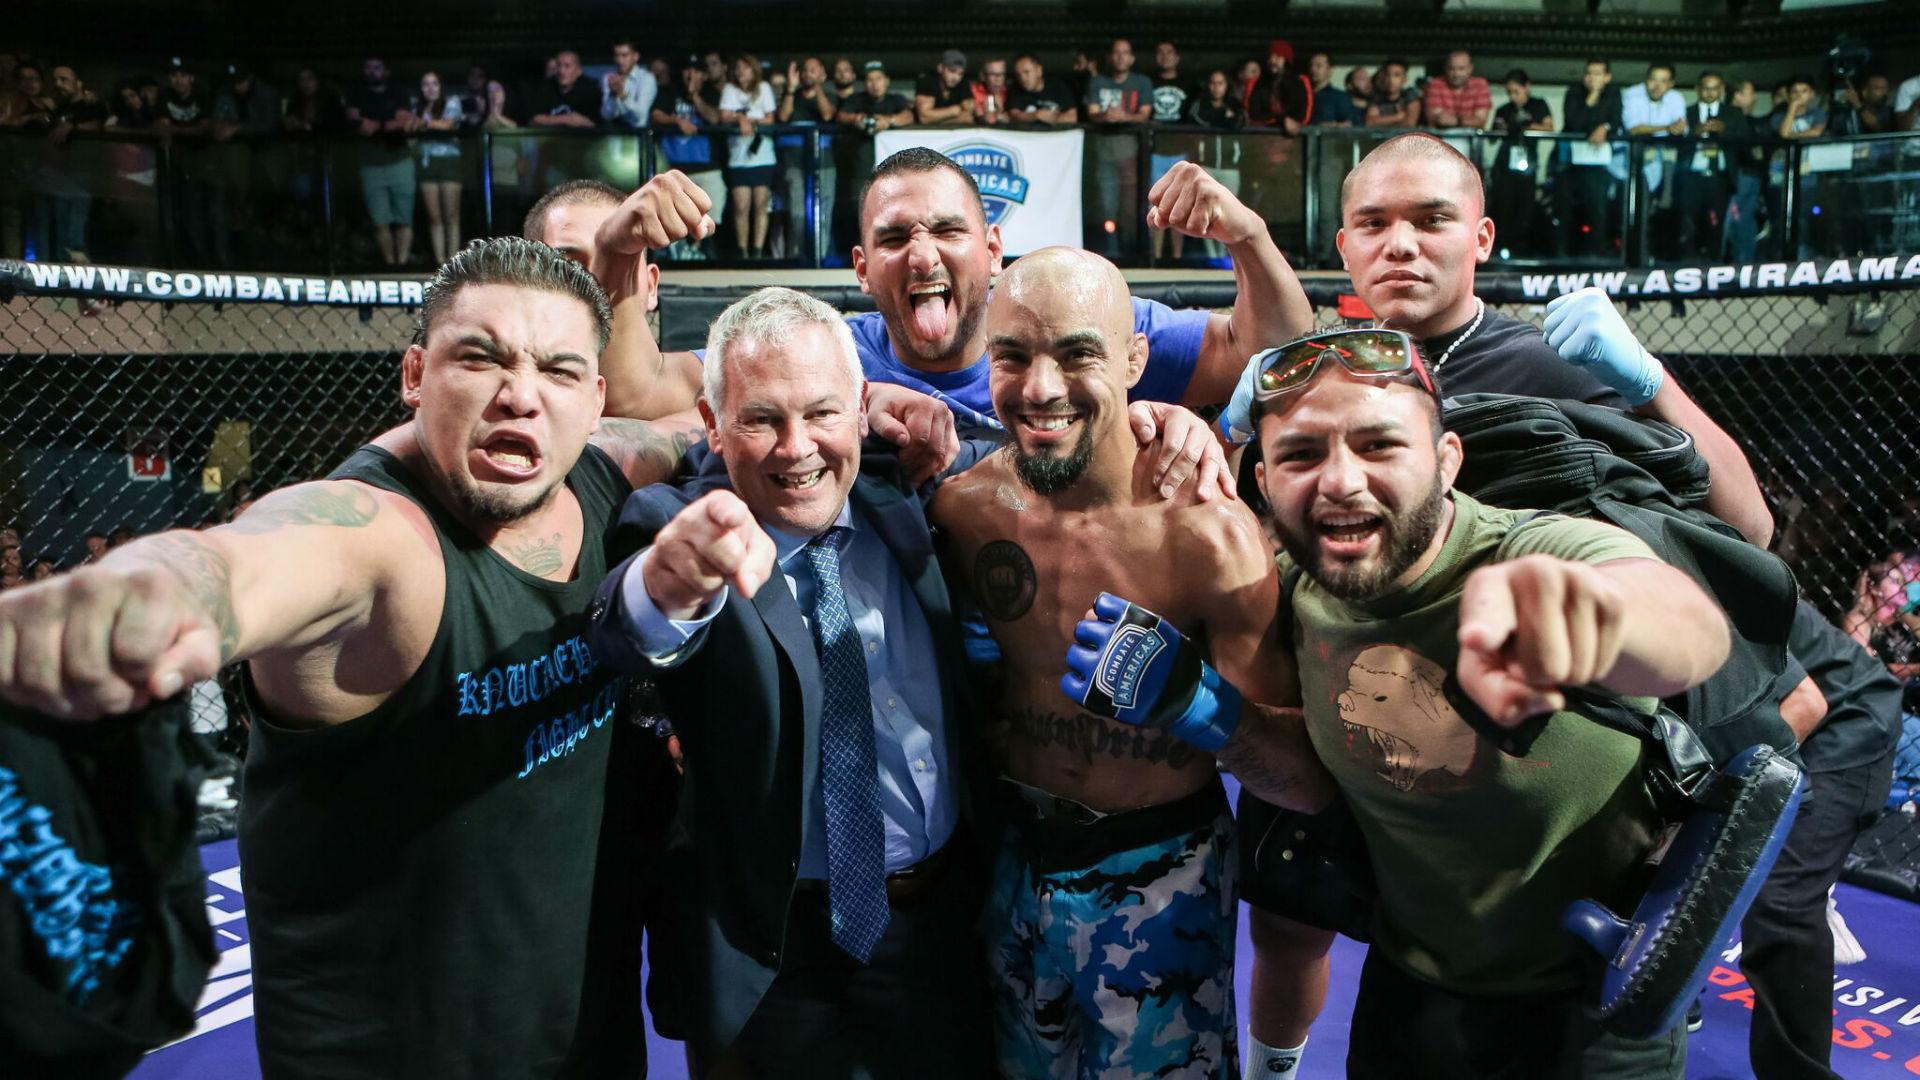 Combate Americas hopes to recapture UFC magic with 'Copa Combate' tournament